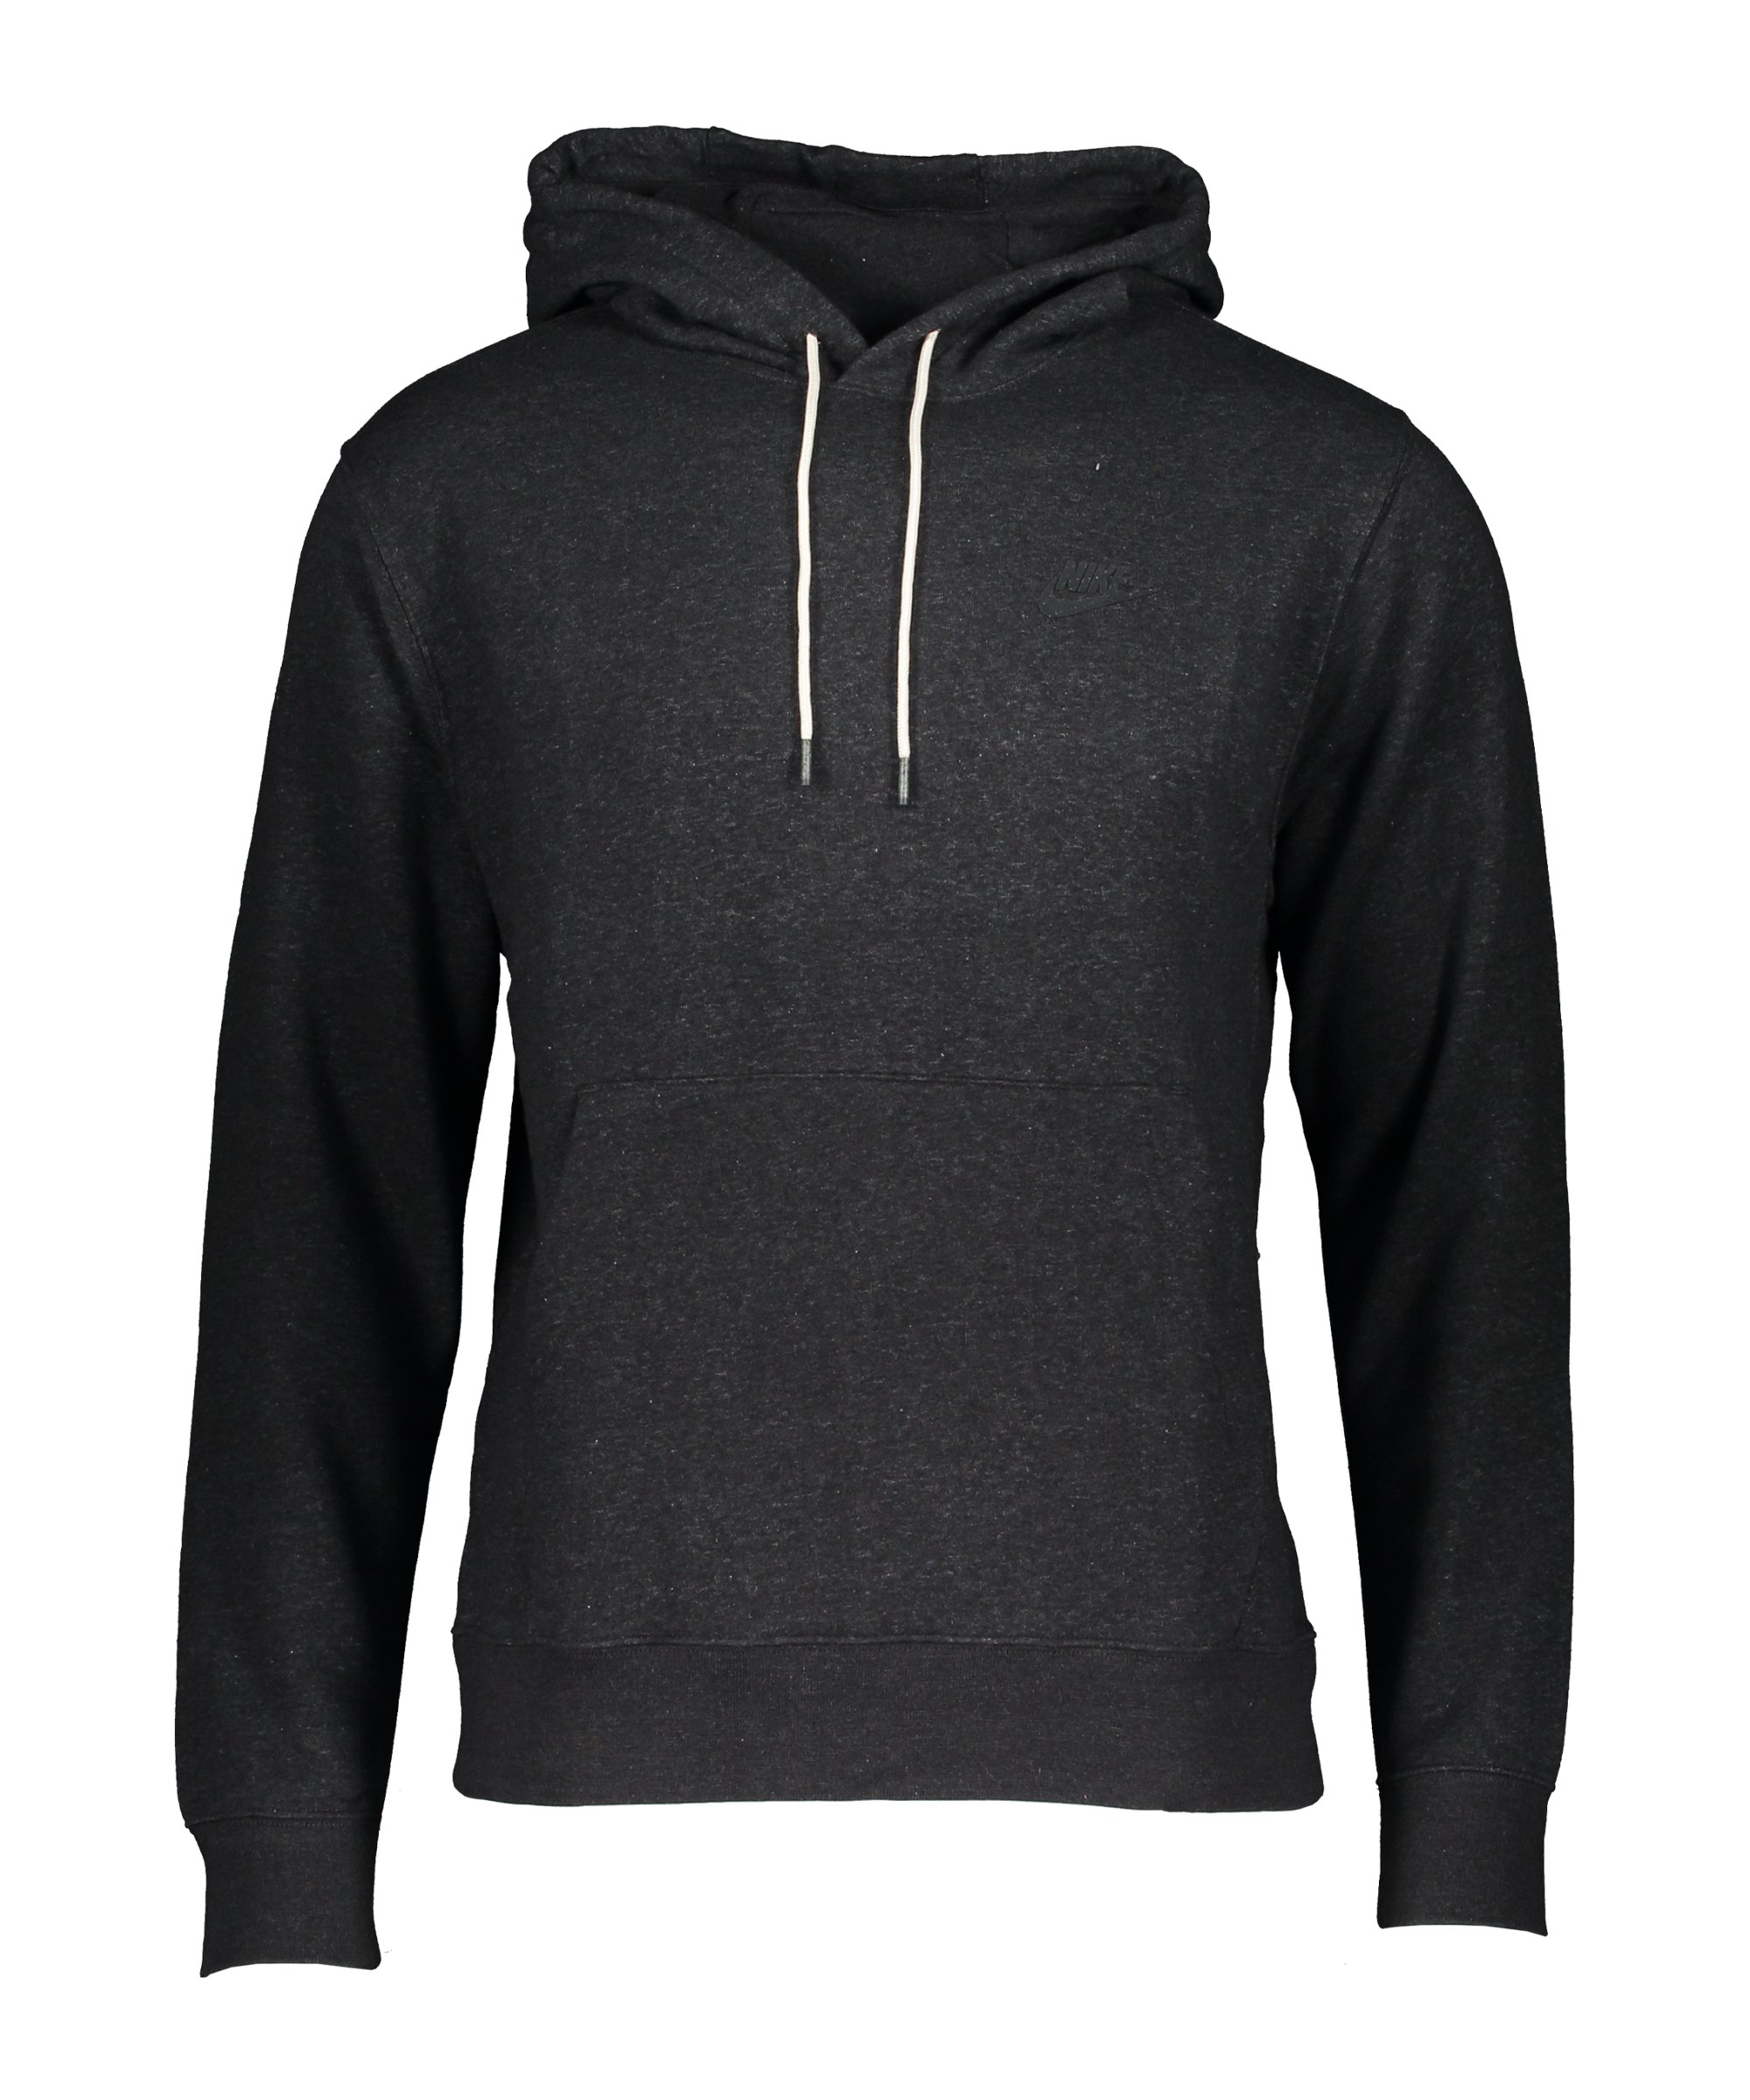 Nike Revival Hoody Schwarz Grau F010 - schwarz